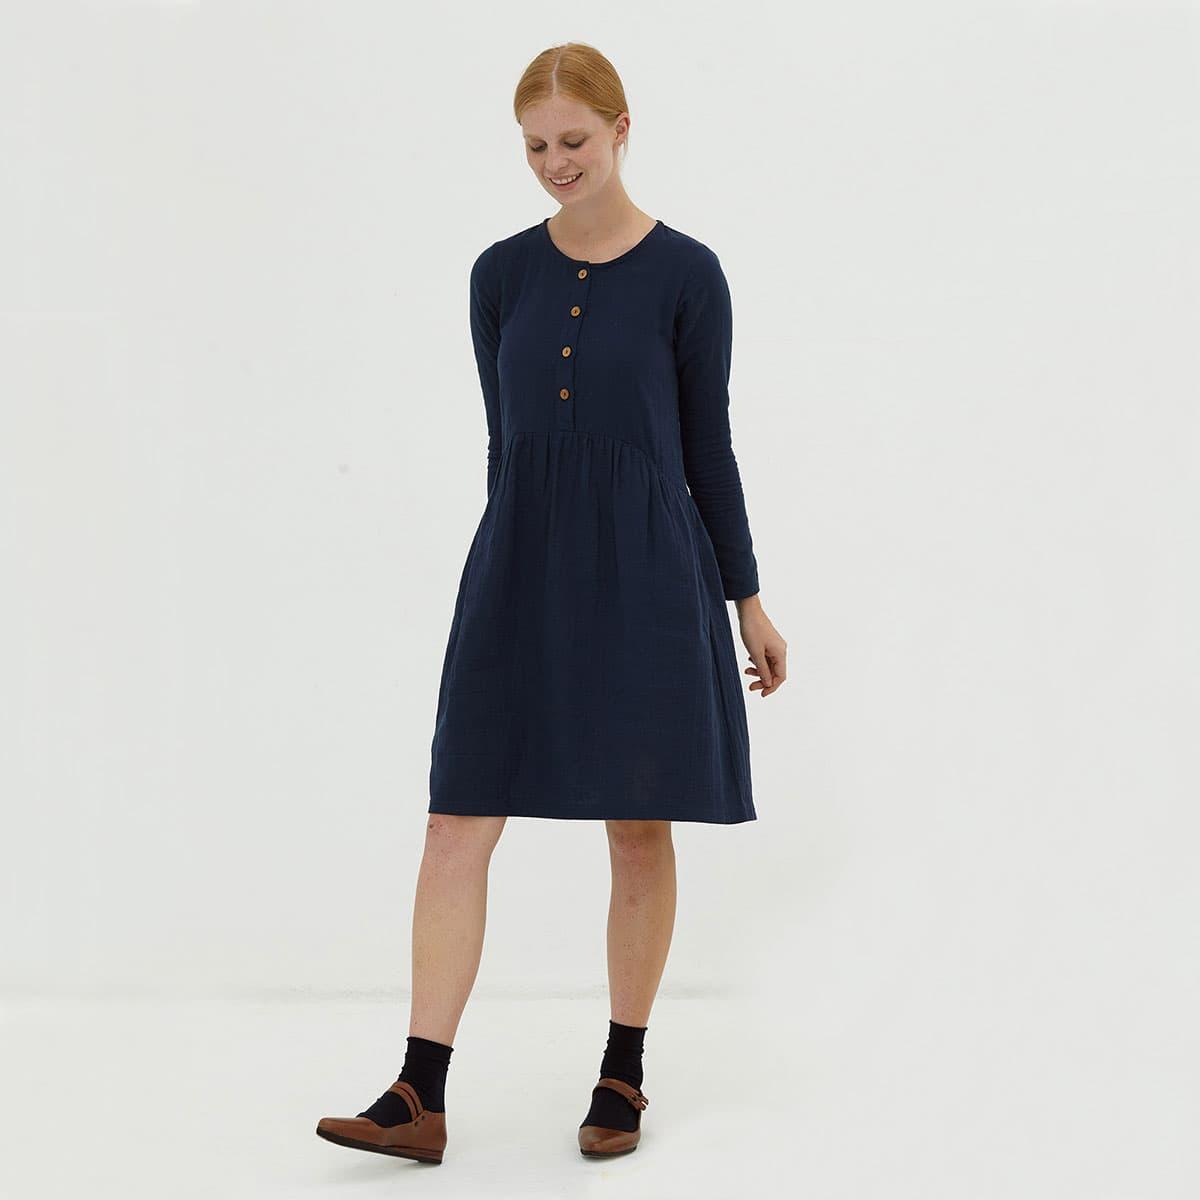 Vestido oversize manga larga azul marino algodón orgánico